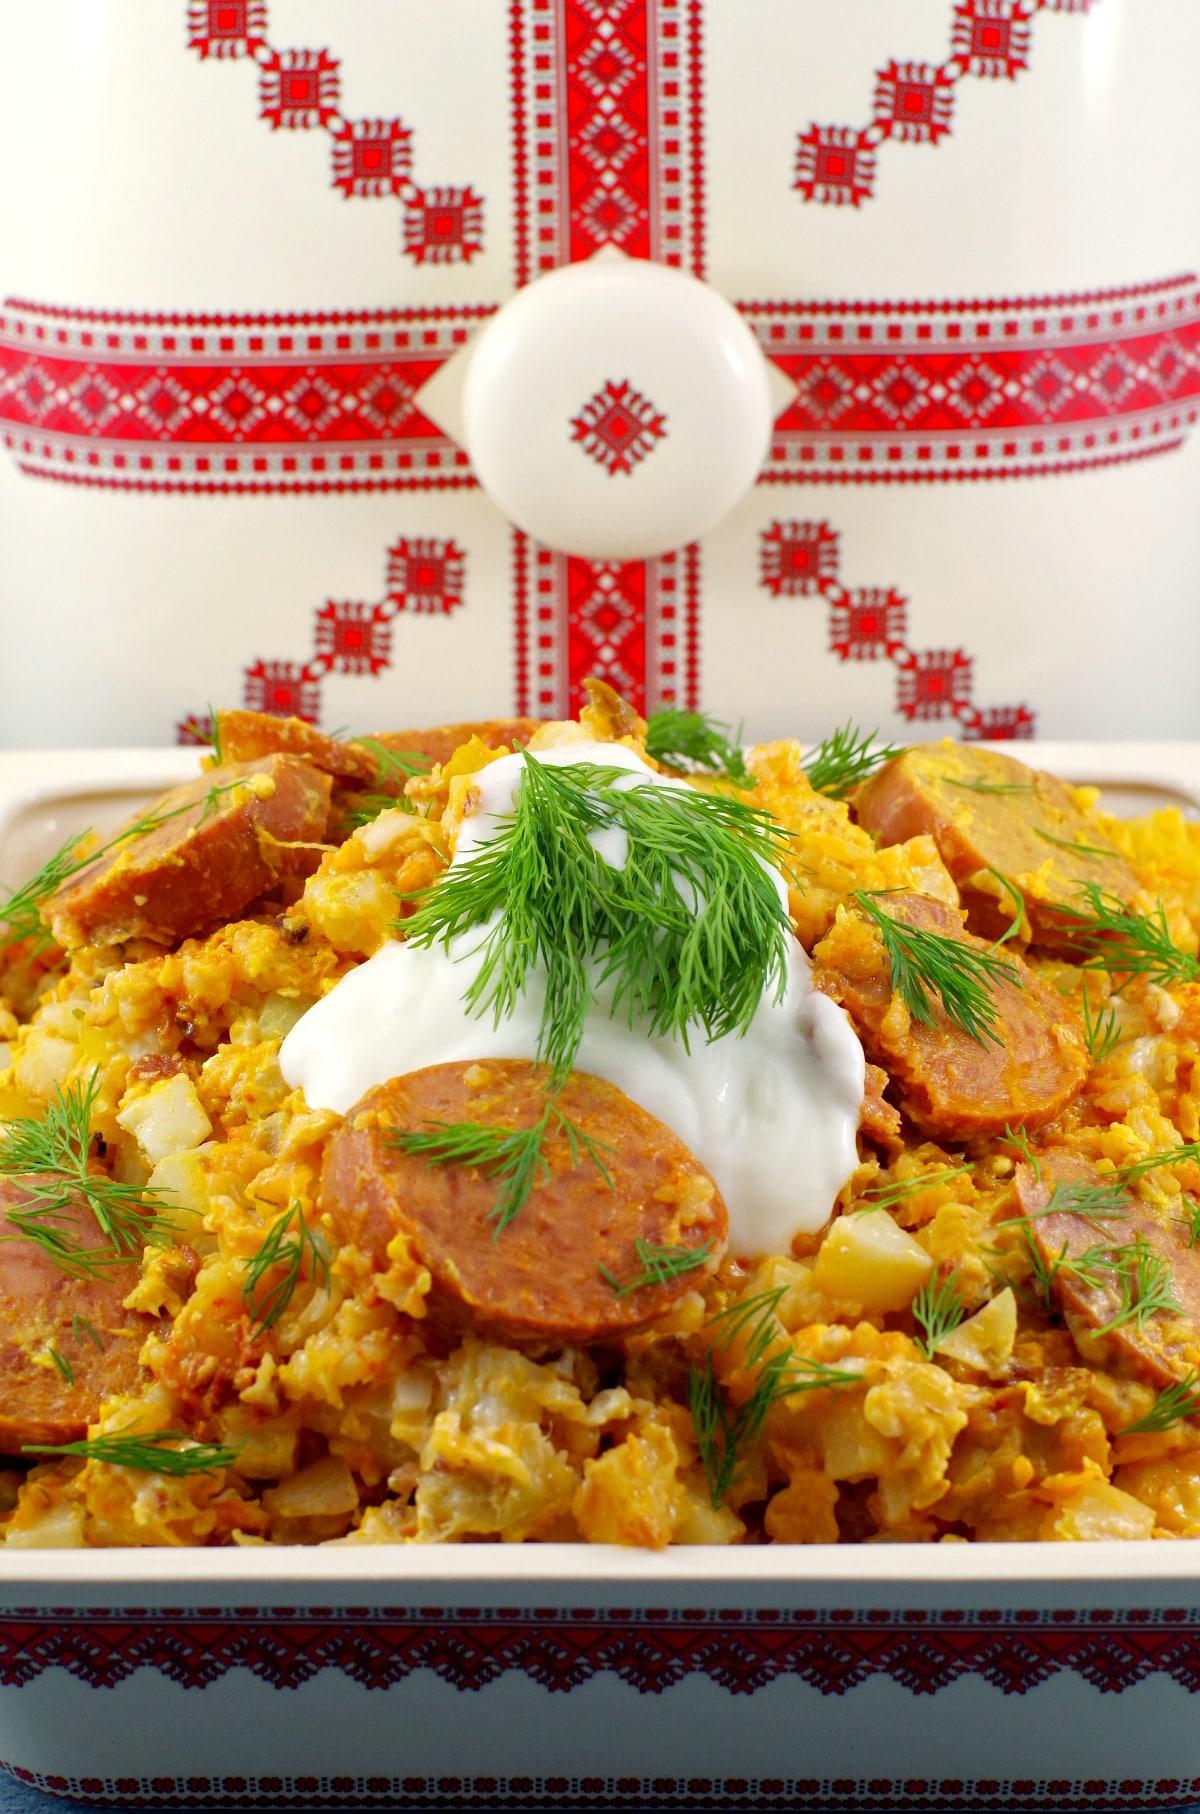 Ukrainian recipe for slow cooker casserole